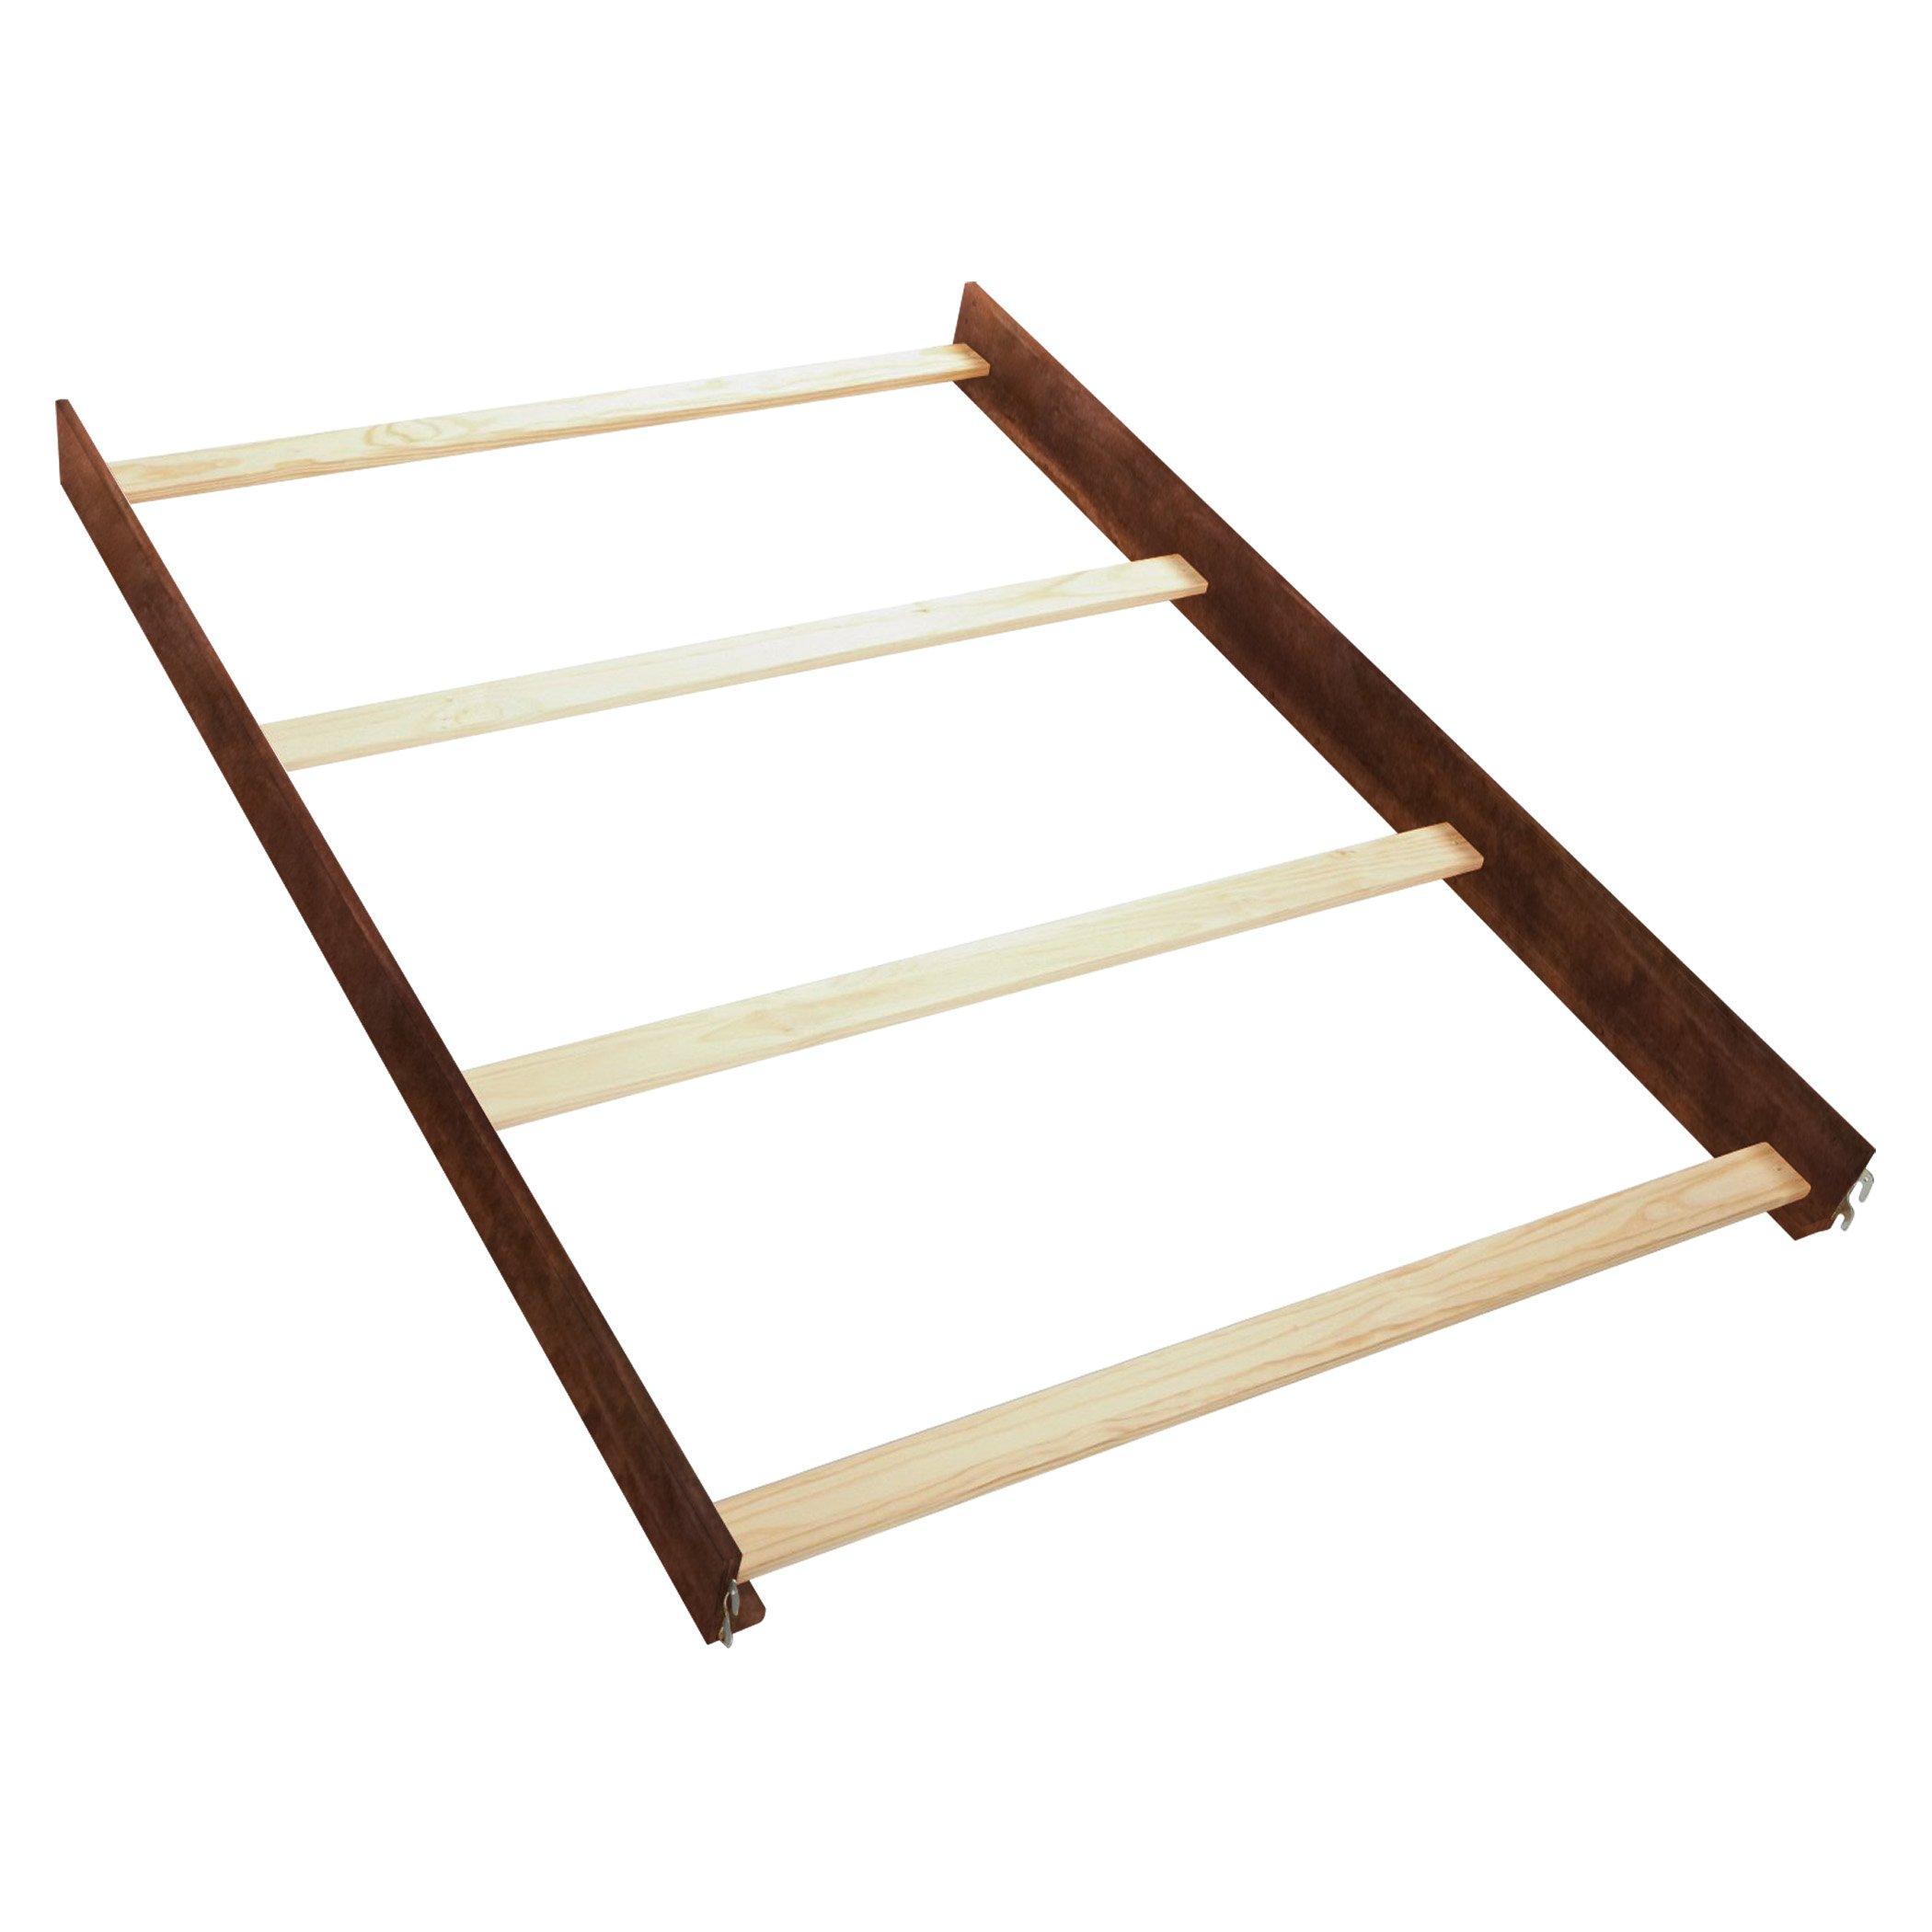 Simmons Kids Full Size Wood Bed Rails, Espresso Truffle